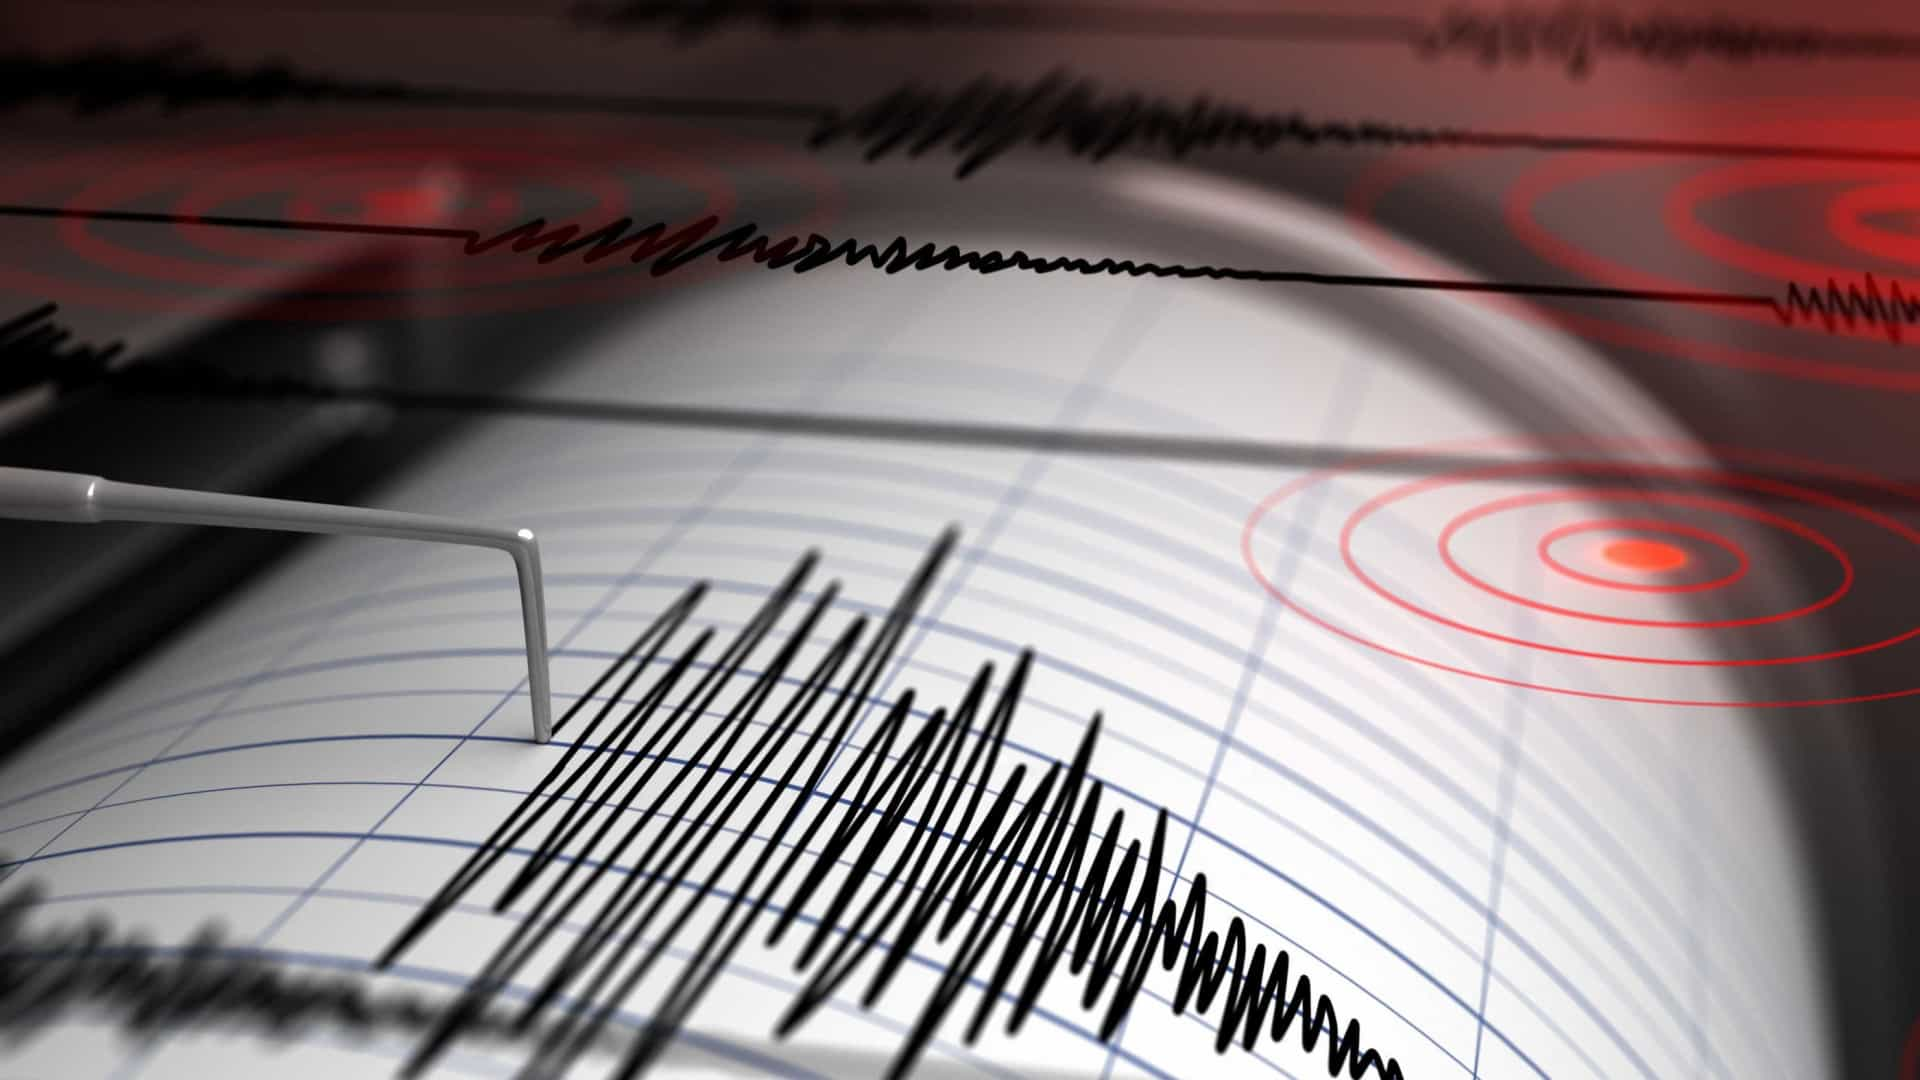 Cientistas criam sistema que 'prevê' terremotos